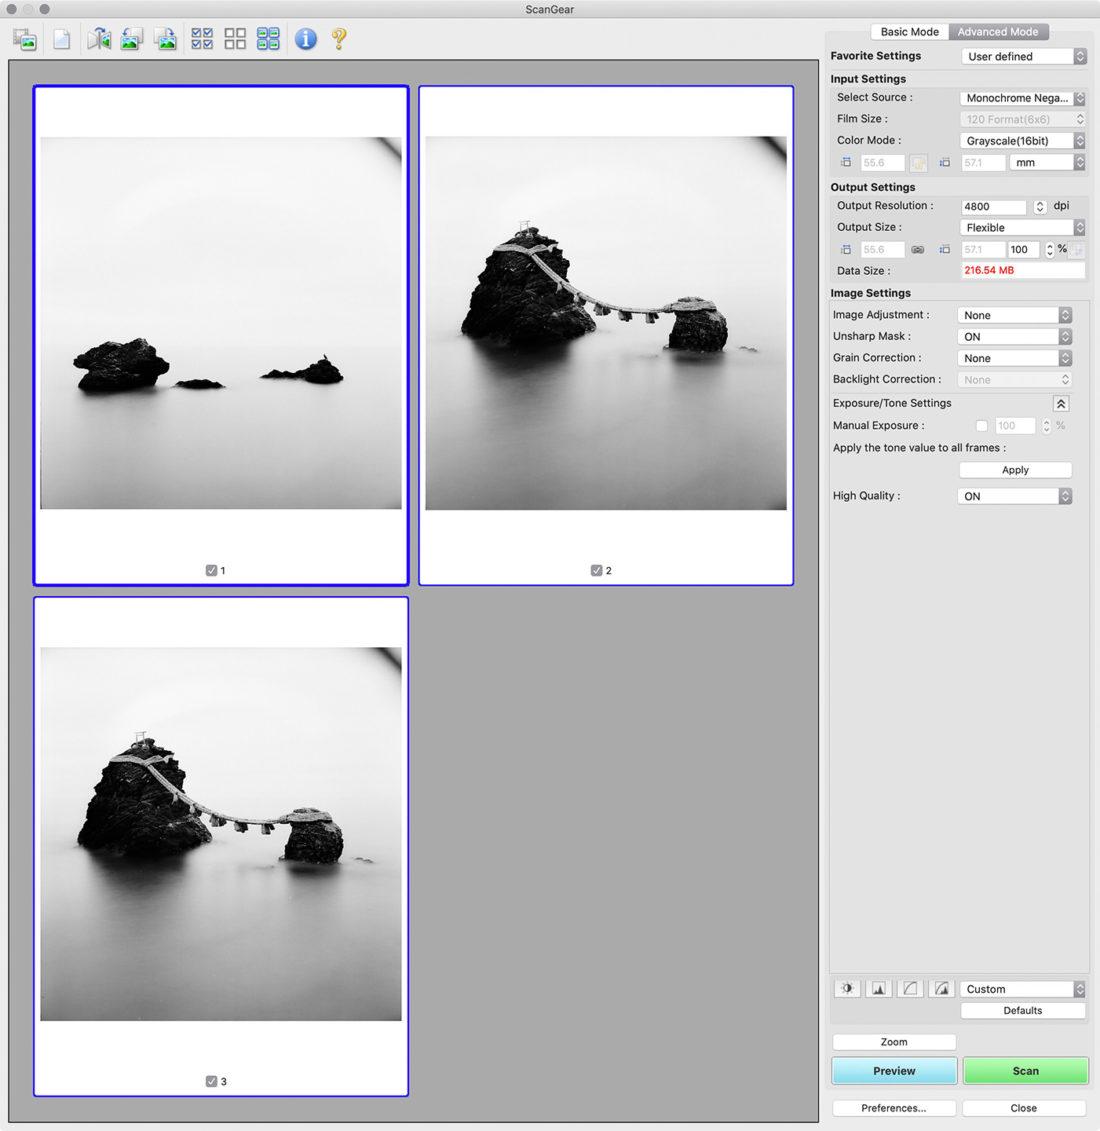 Scanning 120 Film CanonScan ScanGear